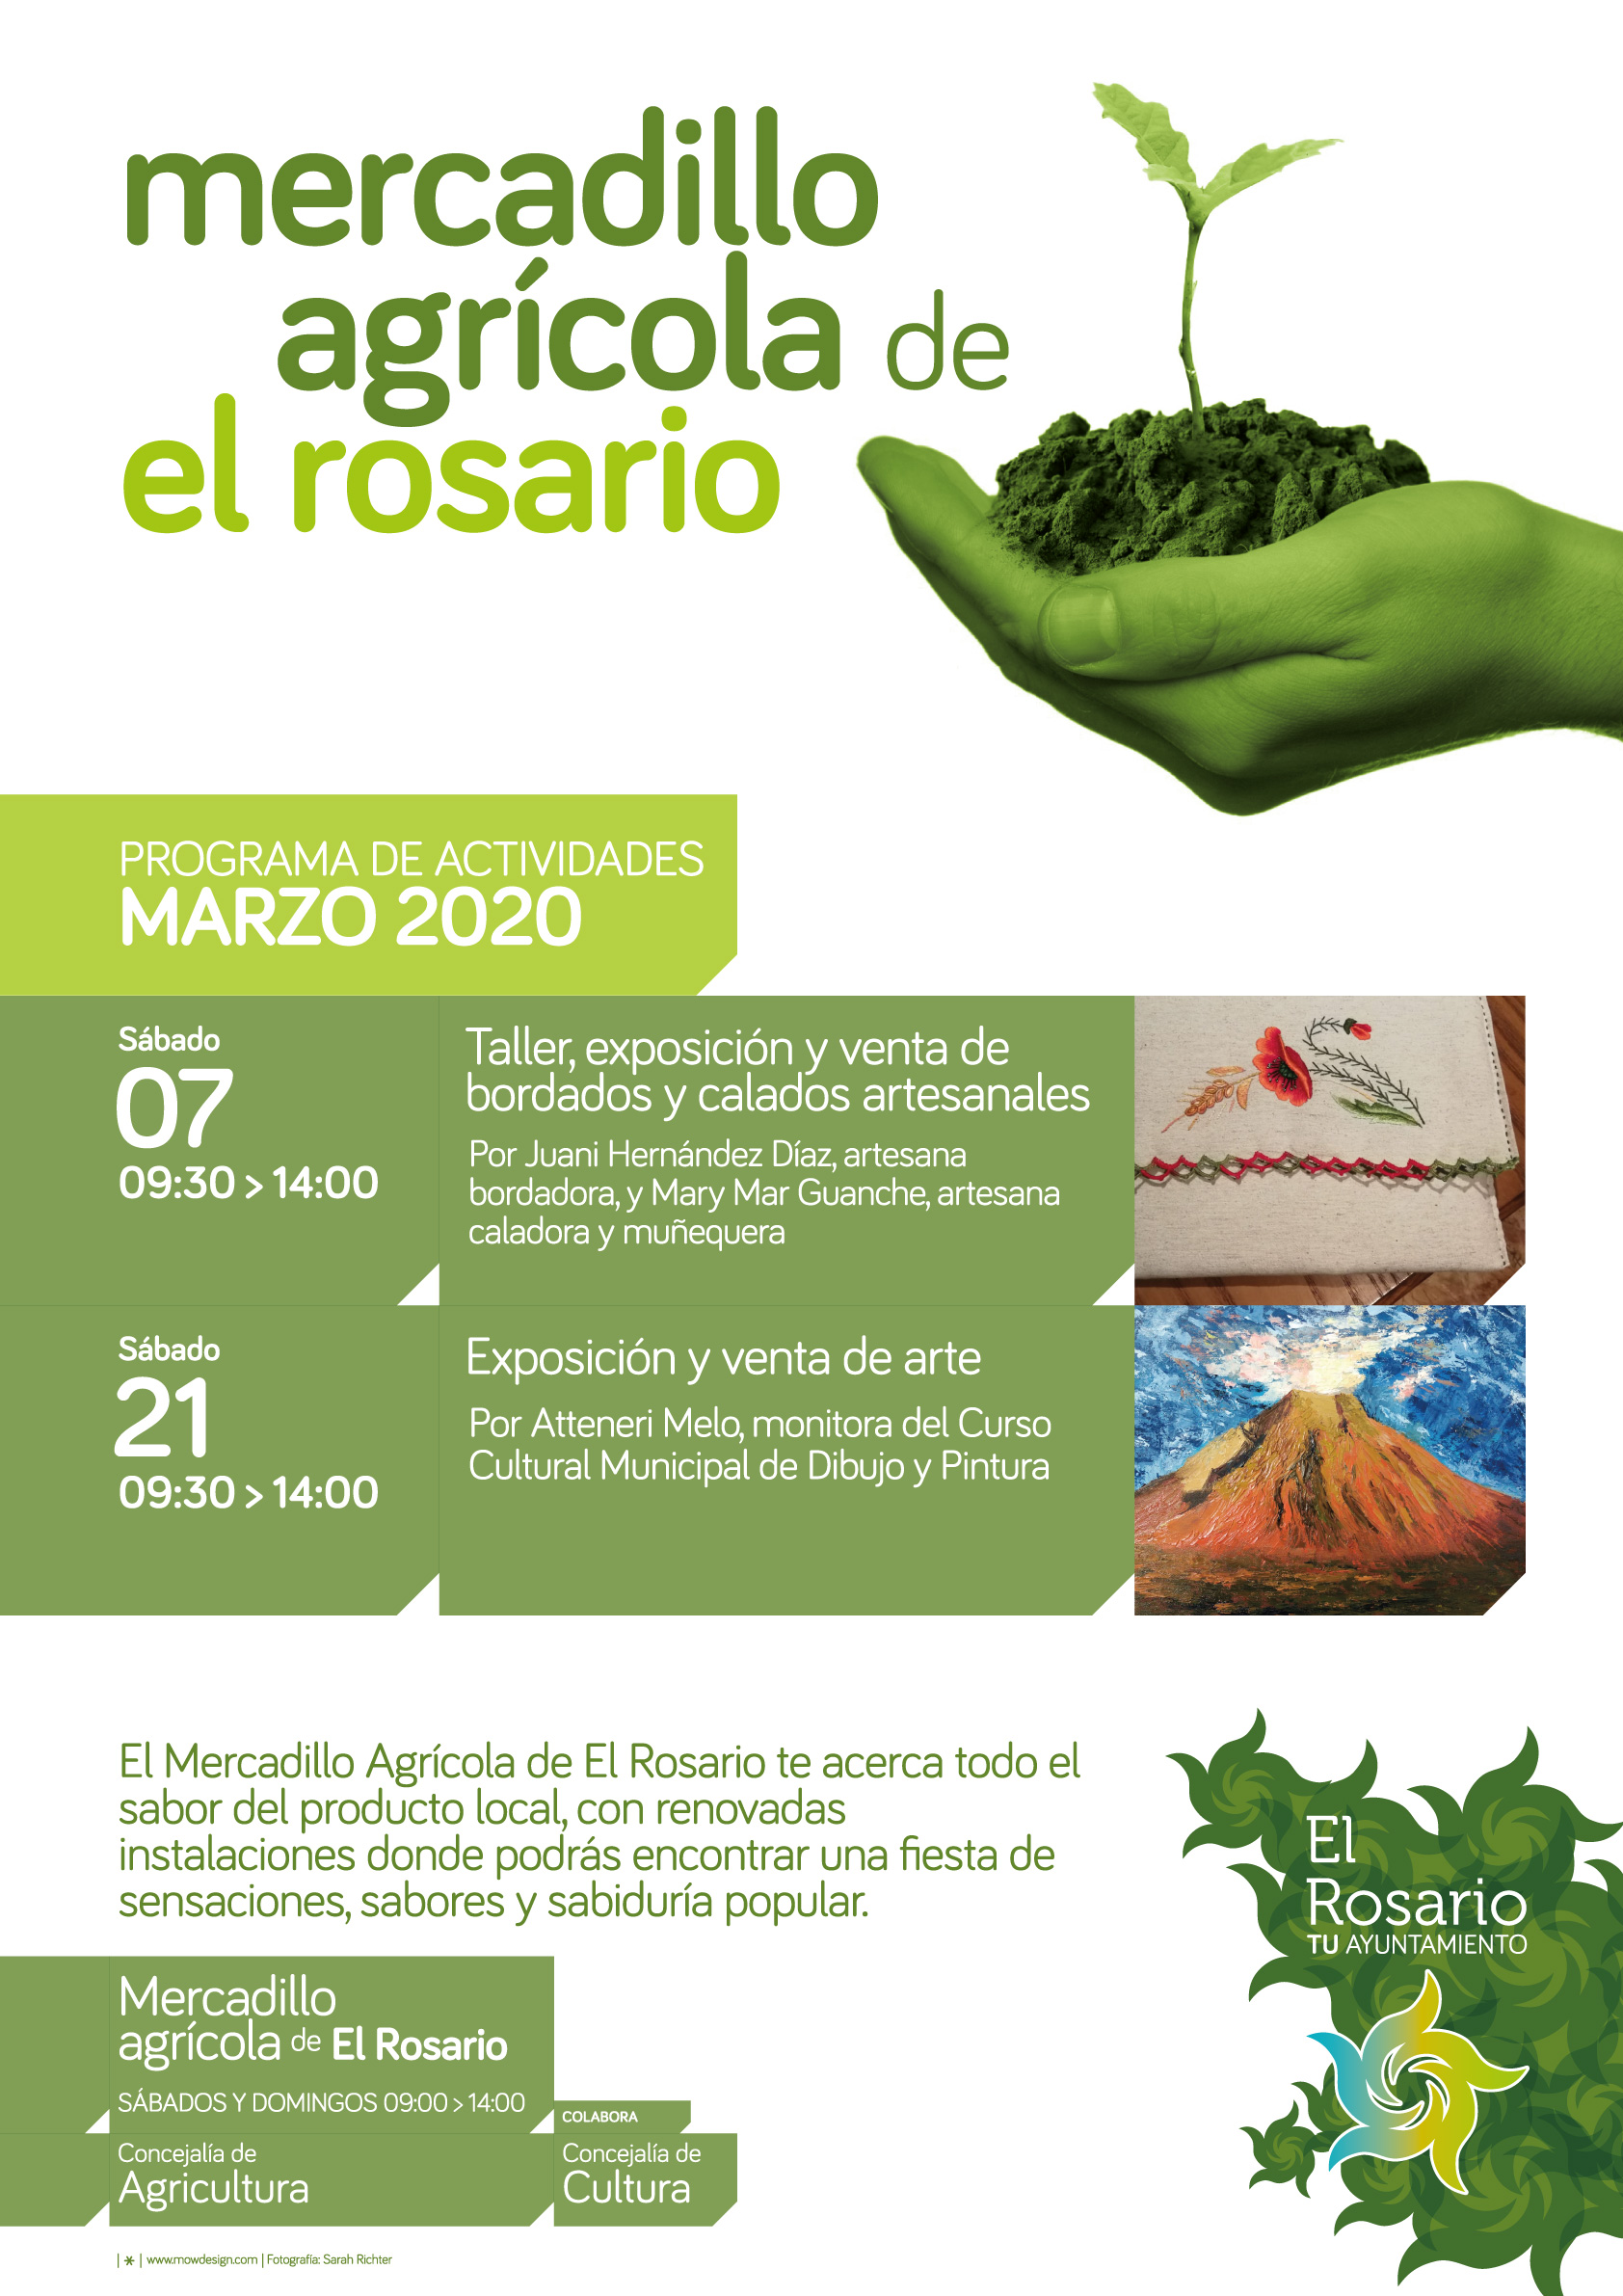 MERCADILLO_AGRICOLA-ACTIVIDADES_MARZO-20200307-CARTEL_A3-20200303-01af-redes